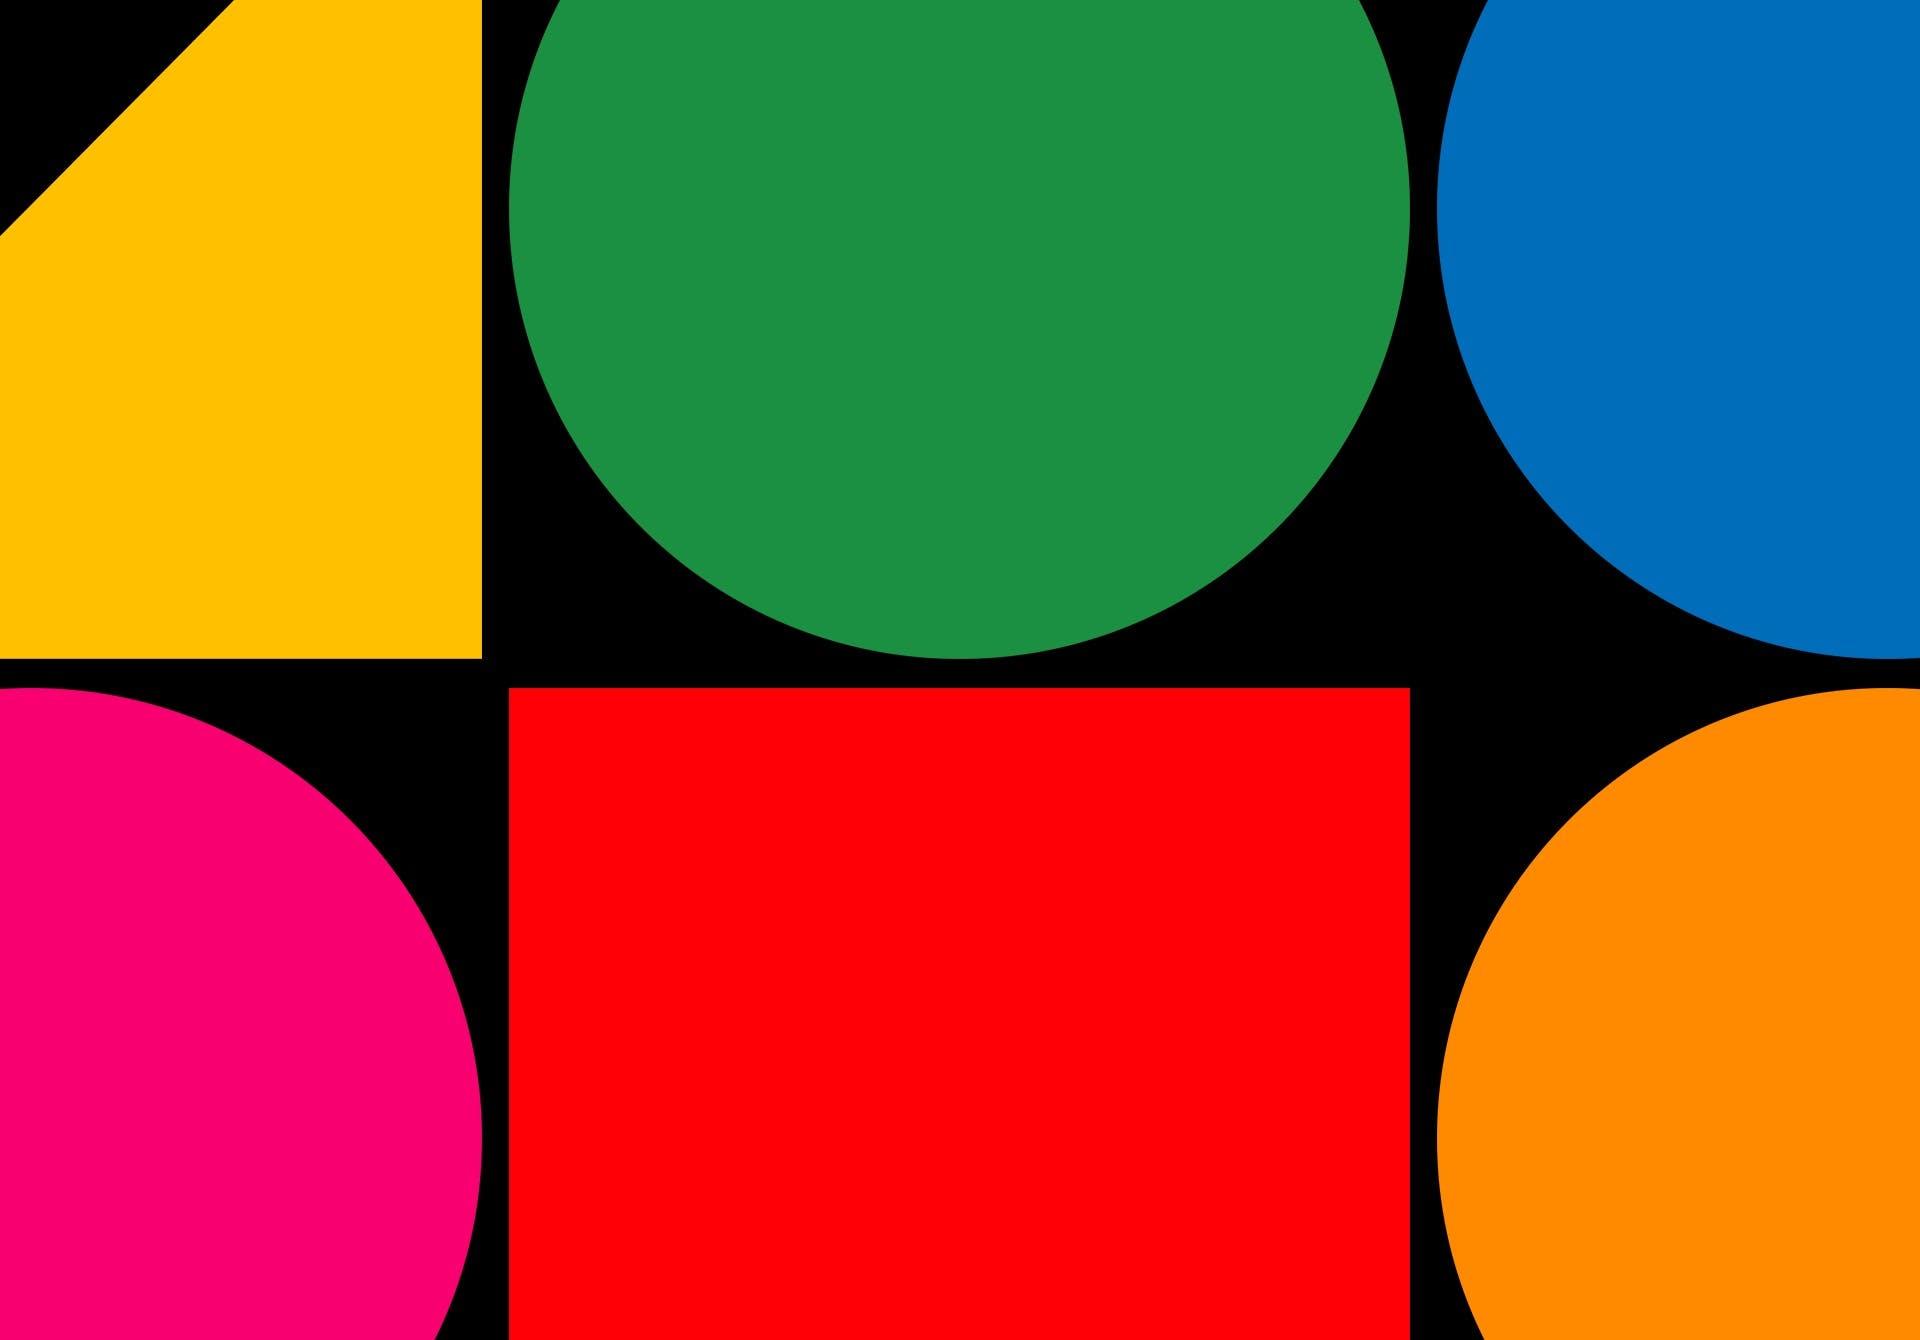 glauber-sampaio-codigo-design-2.jpeg